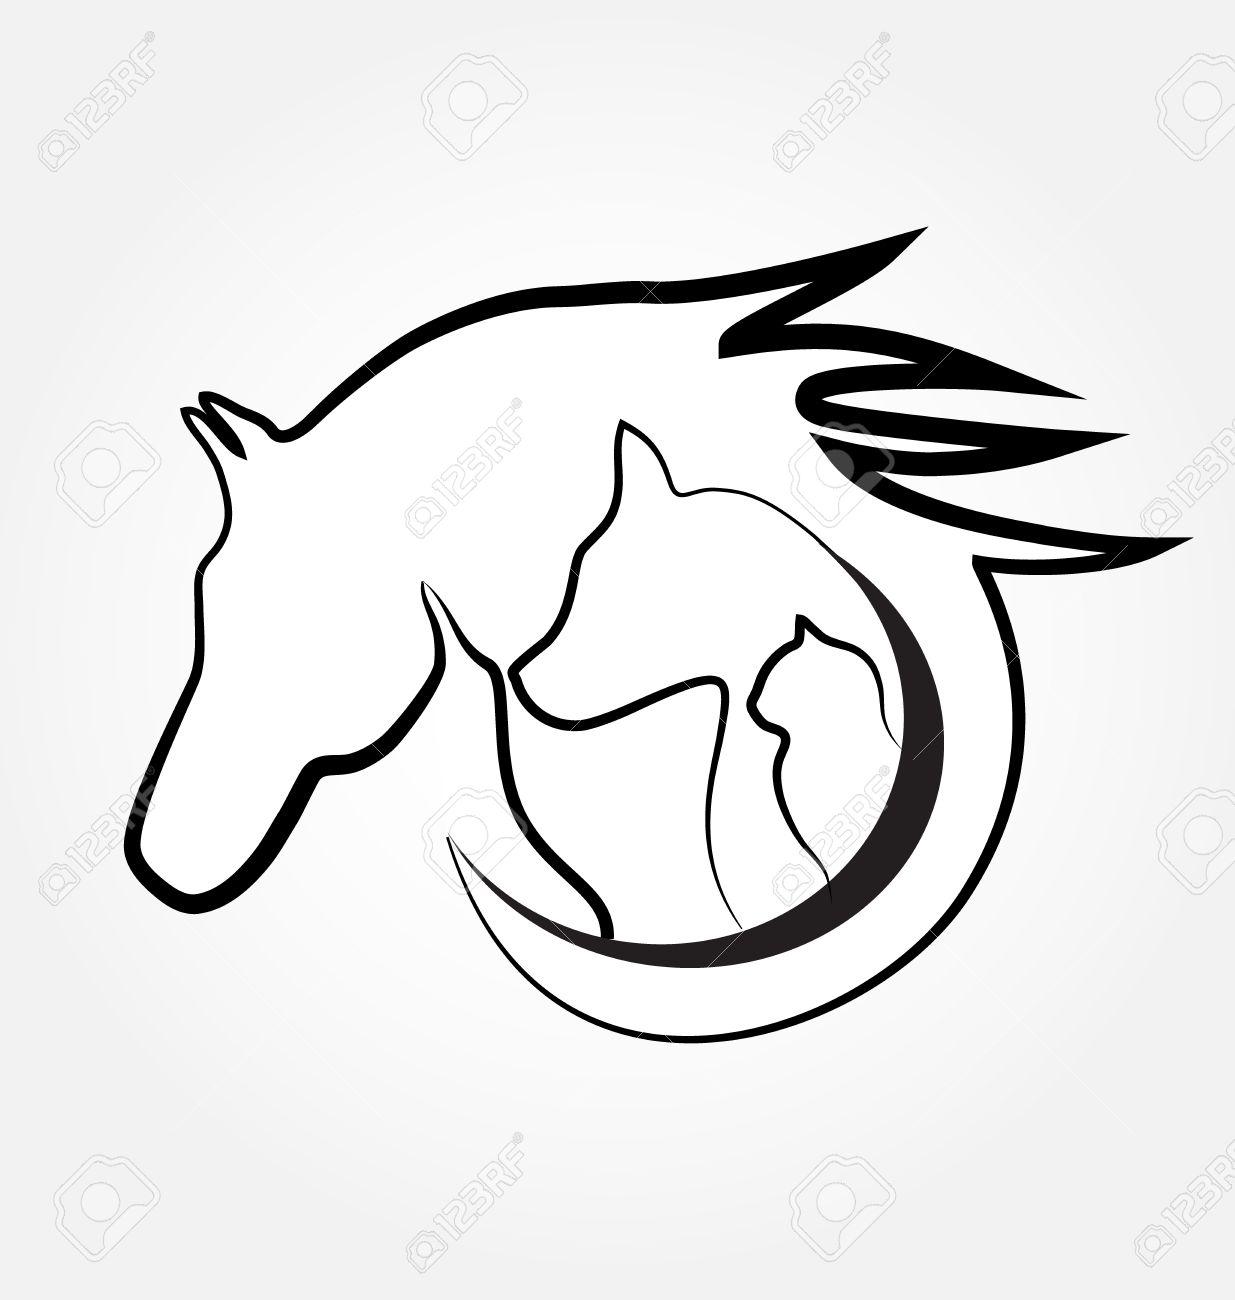 1235x1300 Horse Cat And Dog Identity Card Business Stylized Design Logo